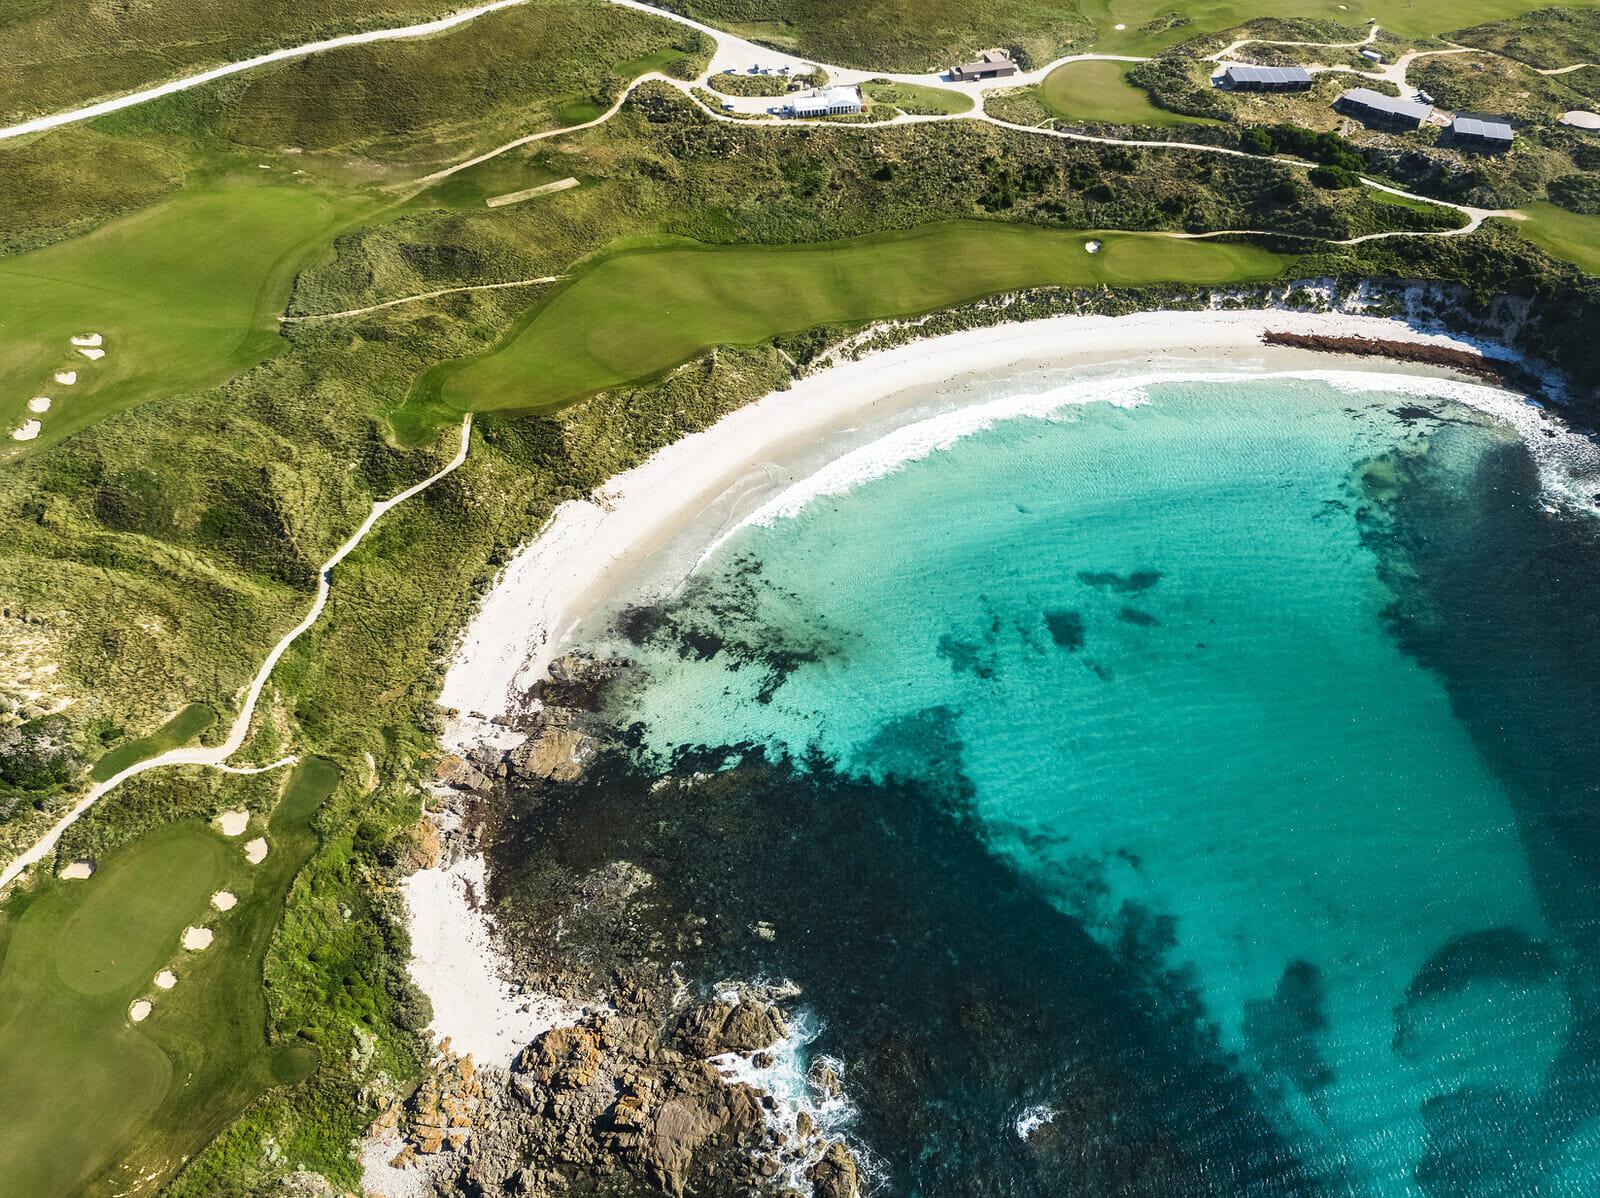 Birds-eye-view of Cape Wickham golf course